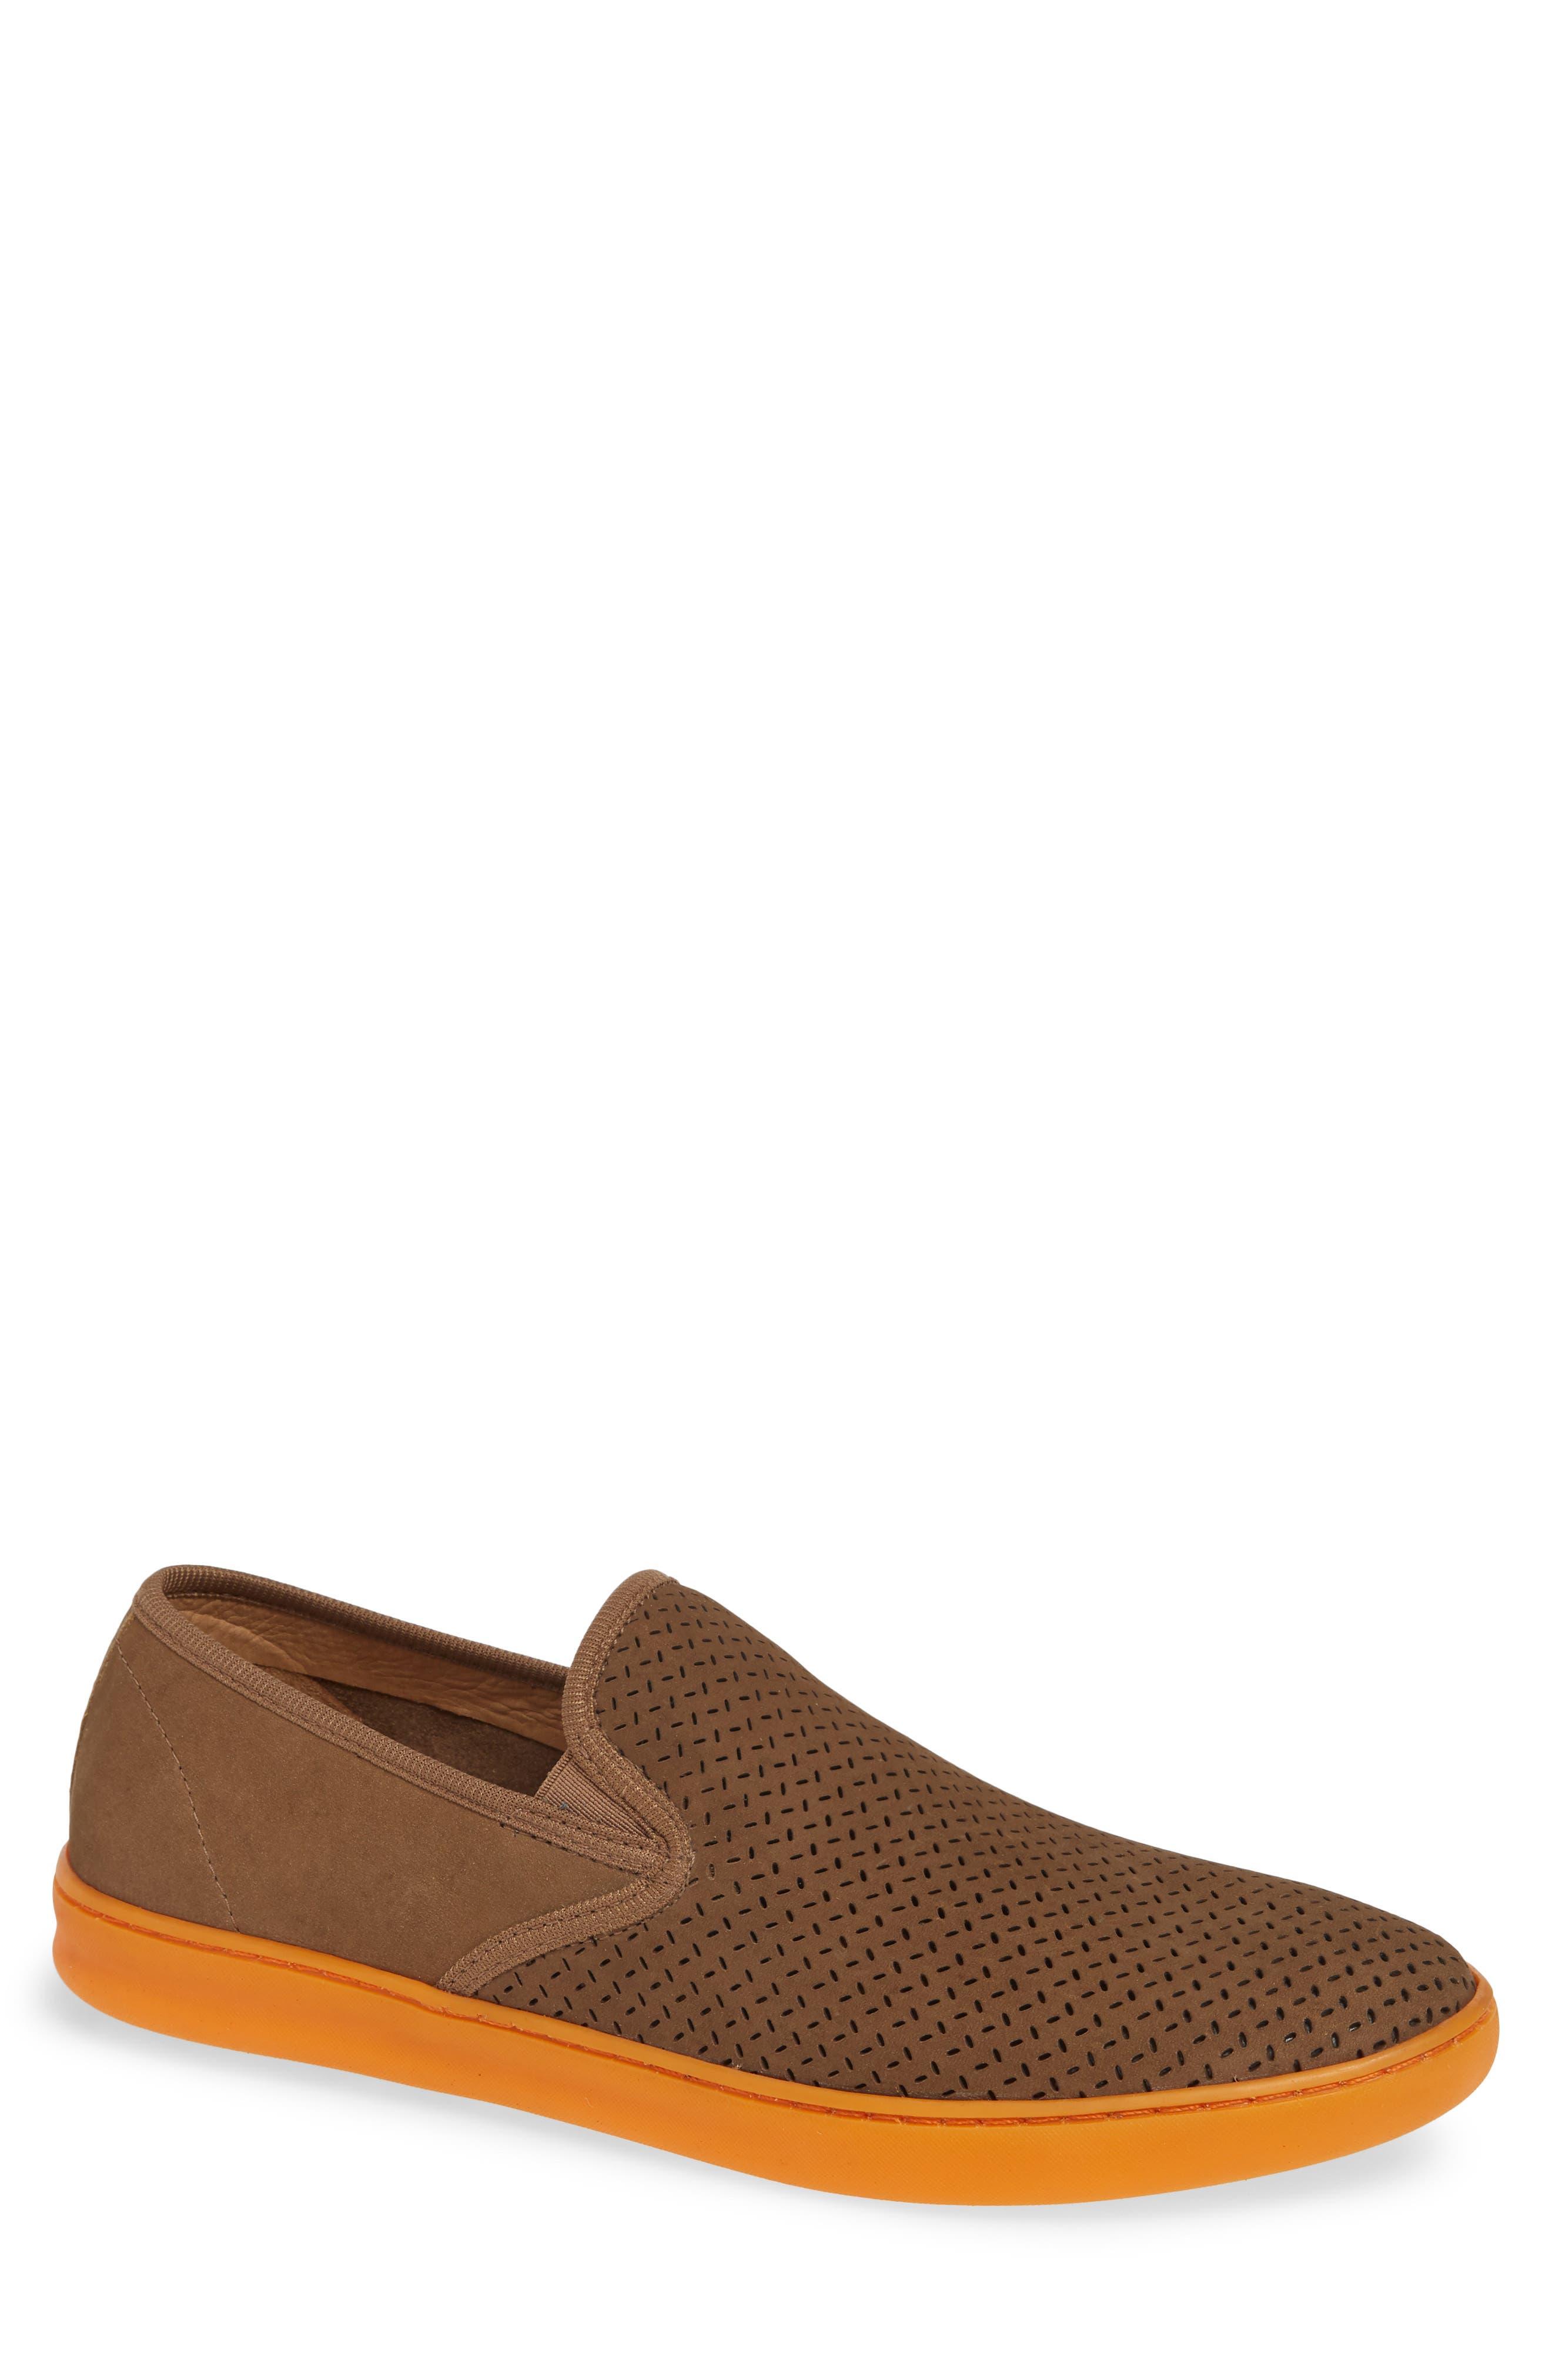 Malibu Perforated Loafer,                         Main,                         color, SAND NUBUCK